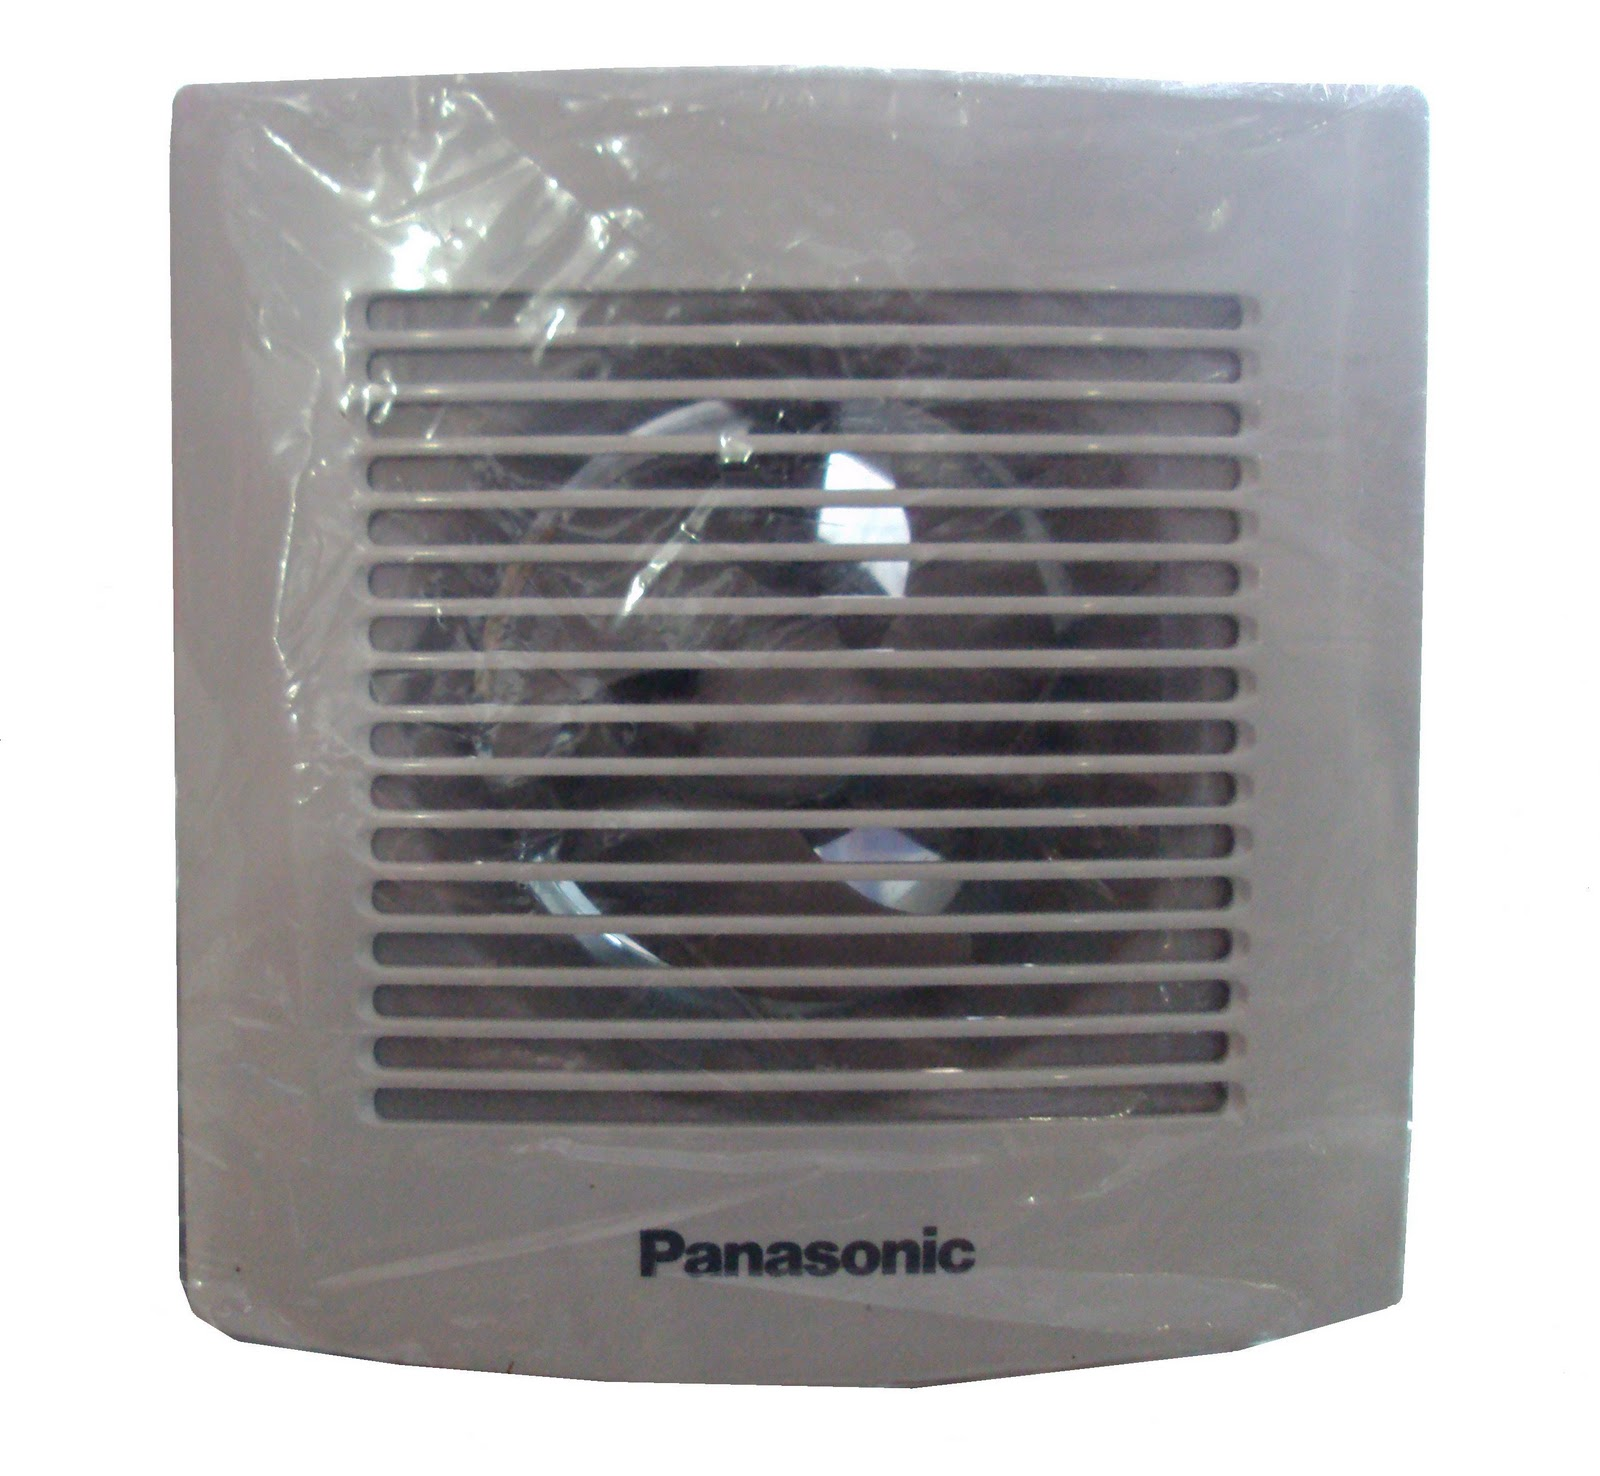 Lh Fan Panasonic